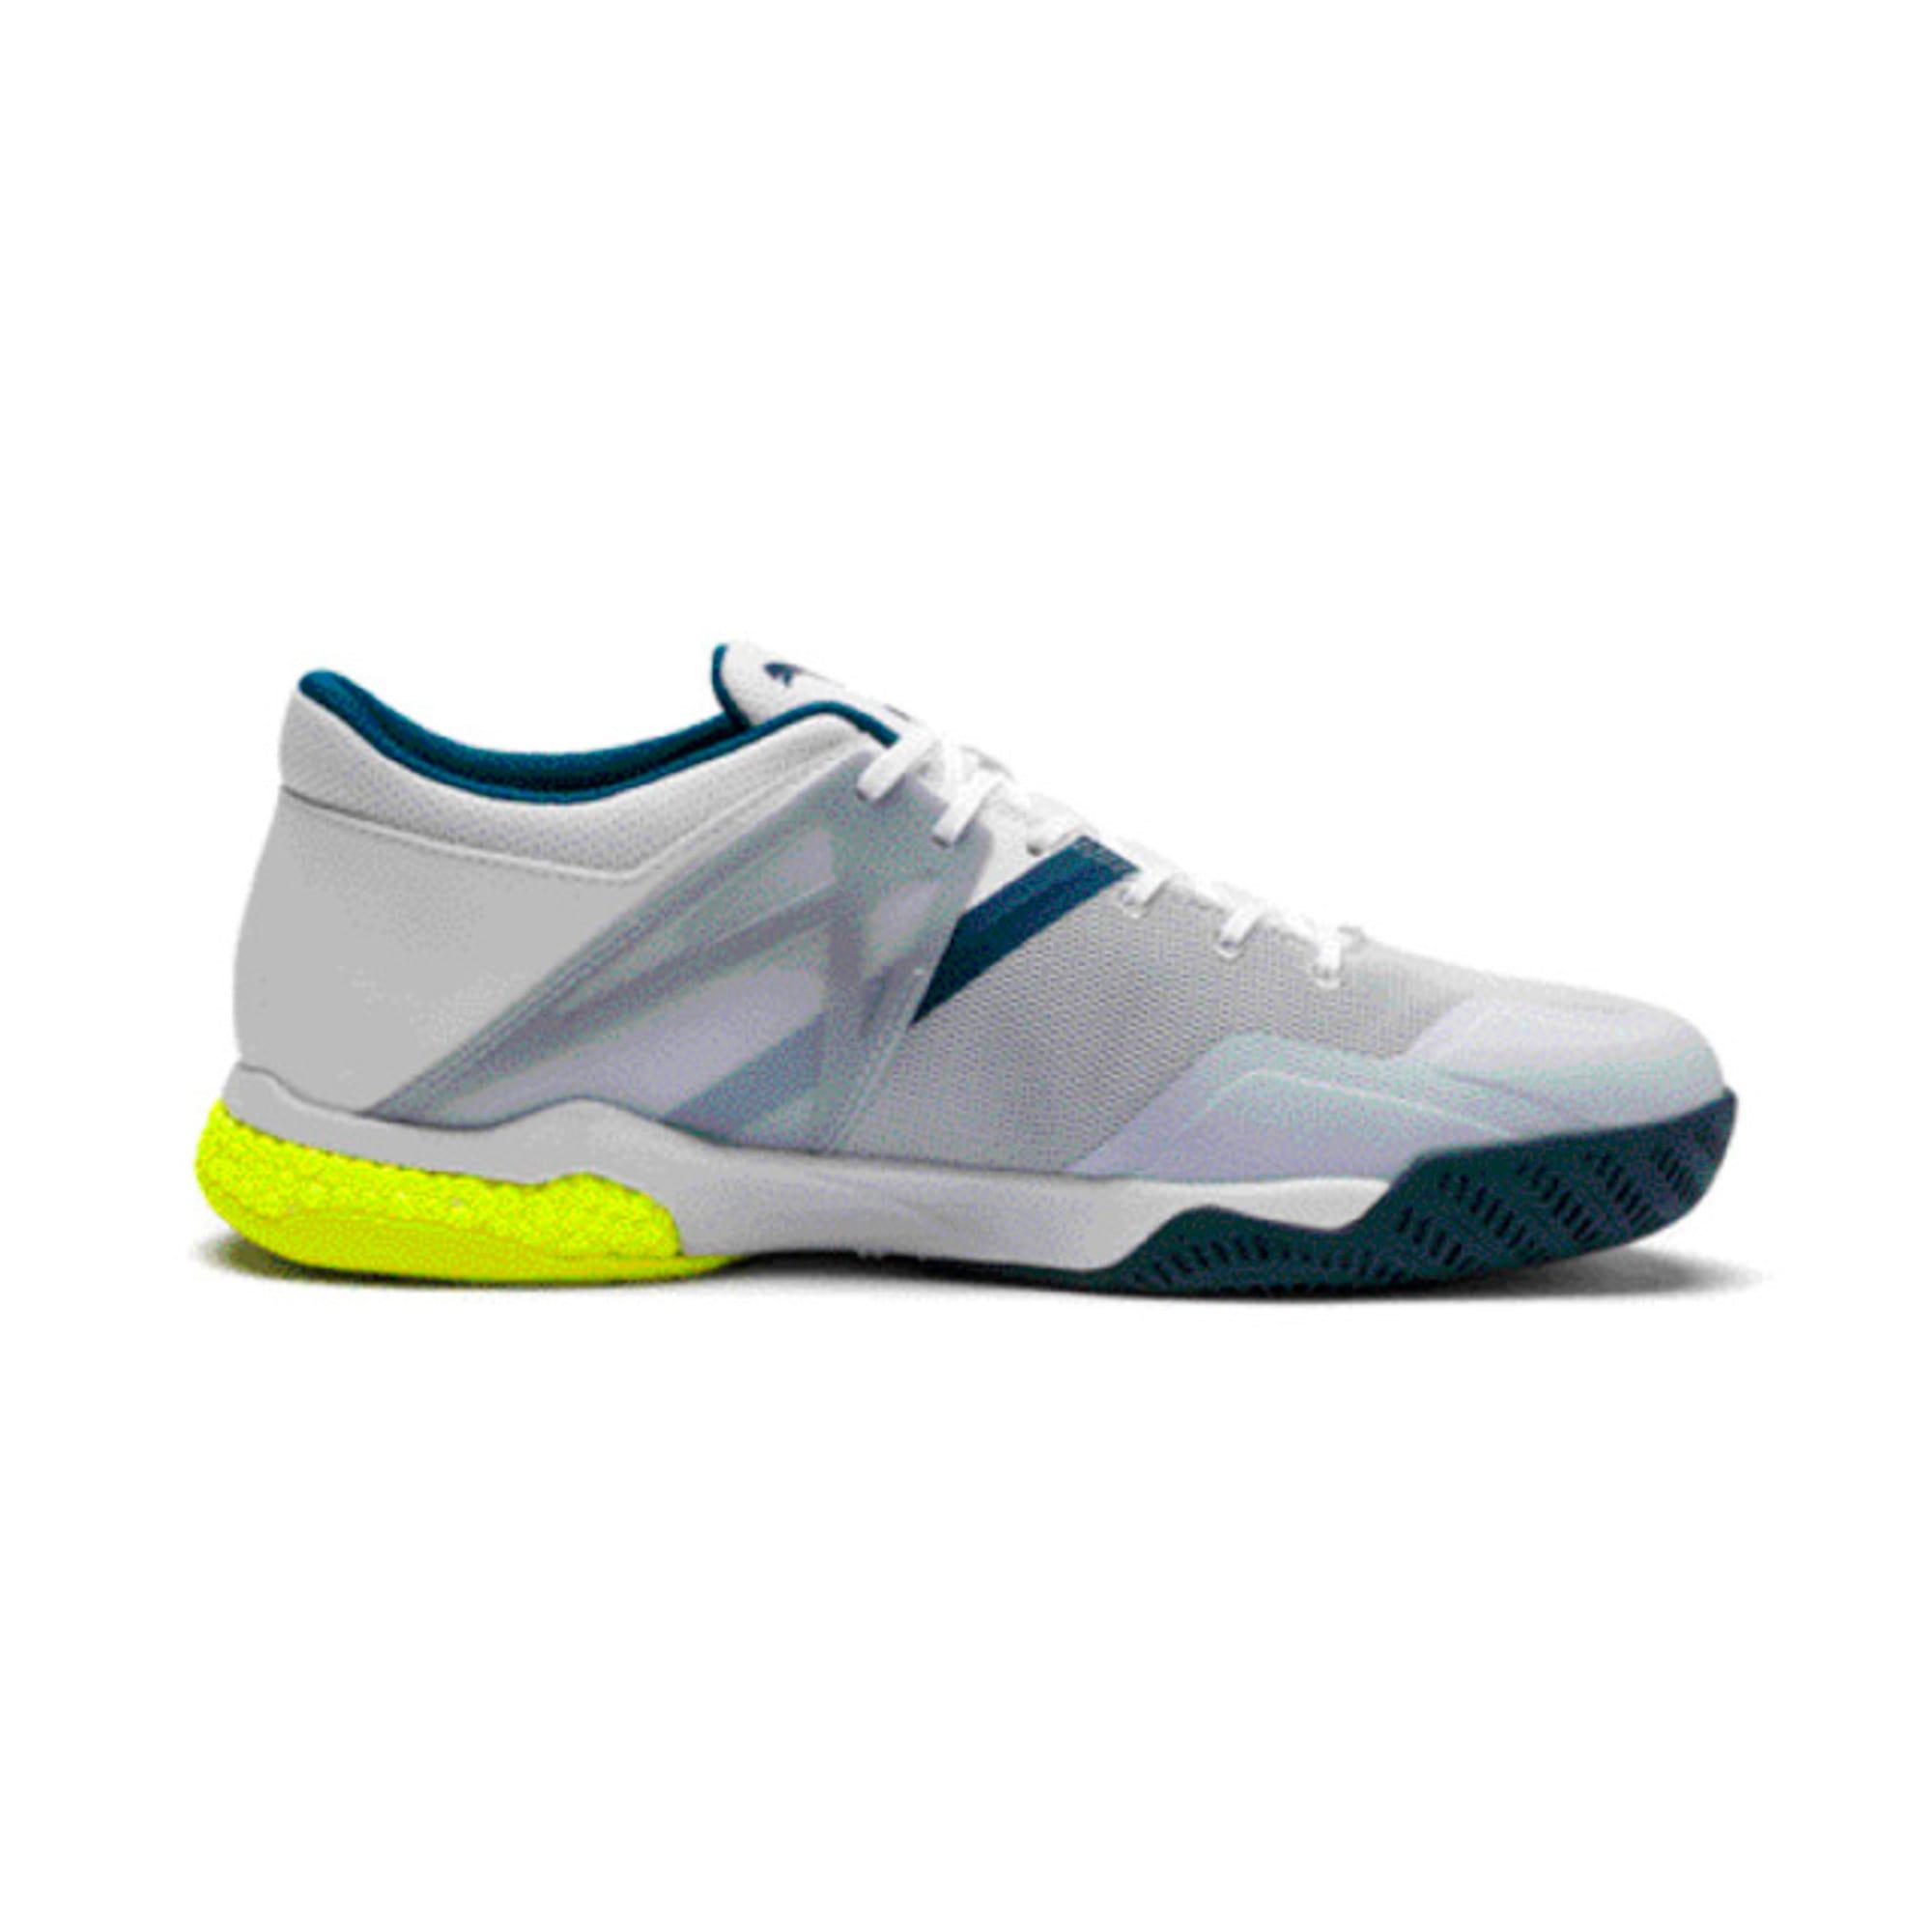 Thumbnail 5 of Explode XT Hybrid 2 Handball Shoes, White-Grey-Yellow-Gibraltar, medium-IND